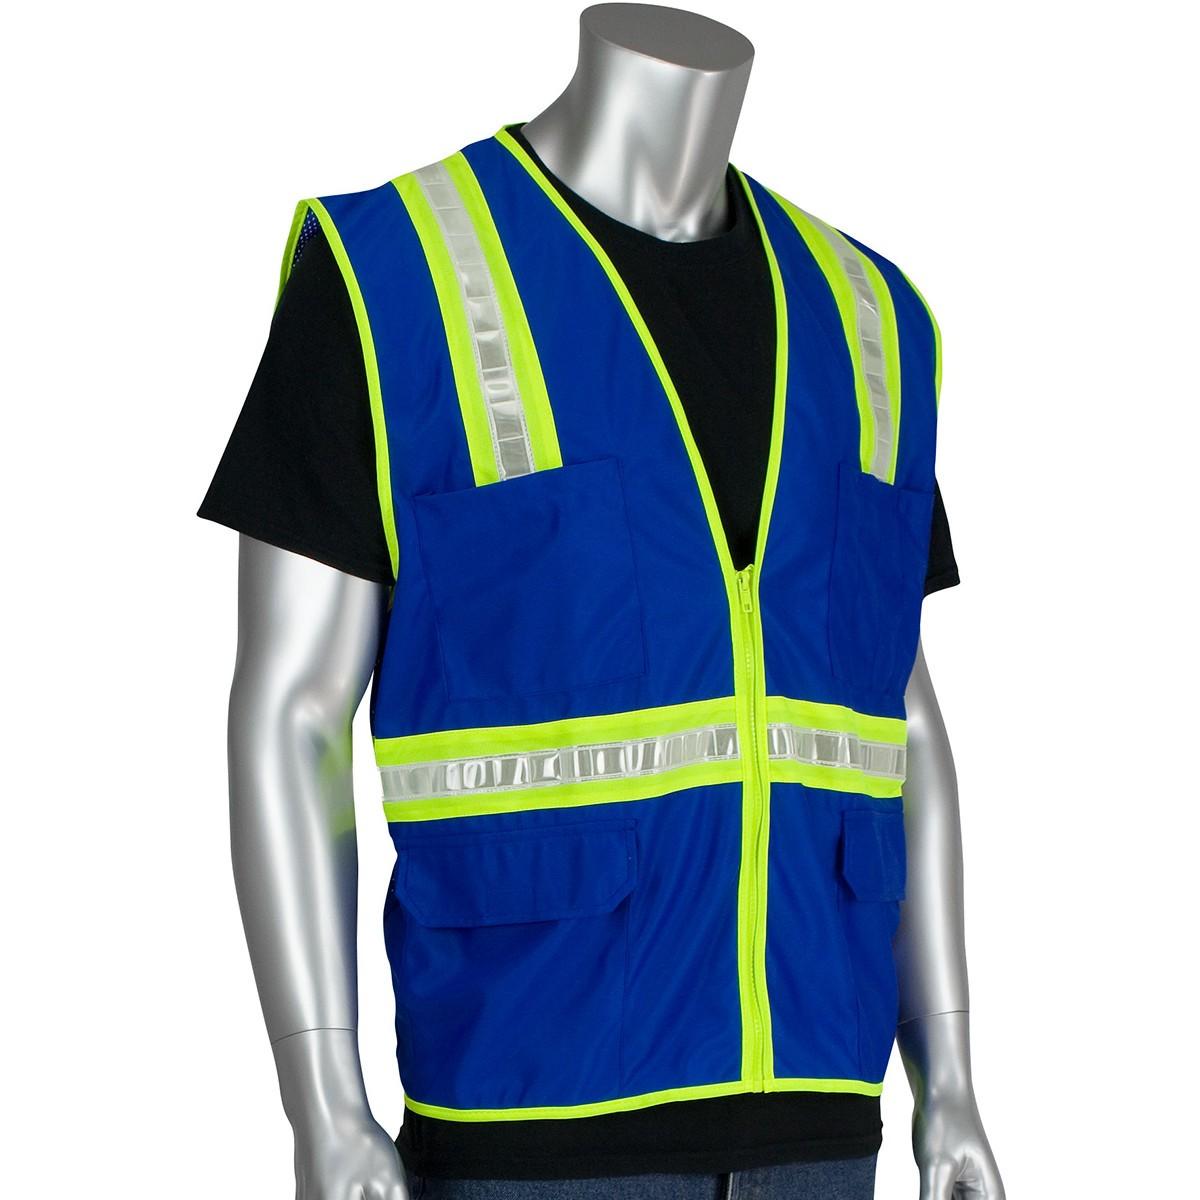 Pip 300 1000 Non Ansi Two Tone Surveyor Safety Vest Blue